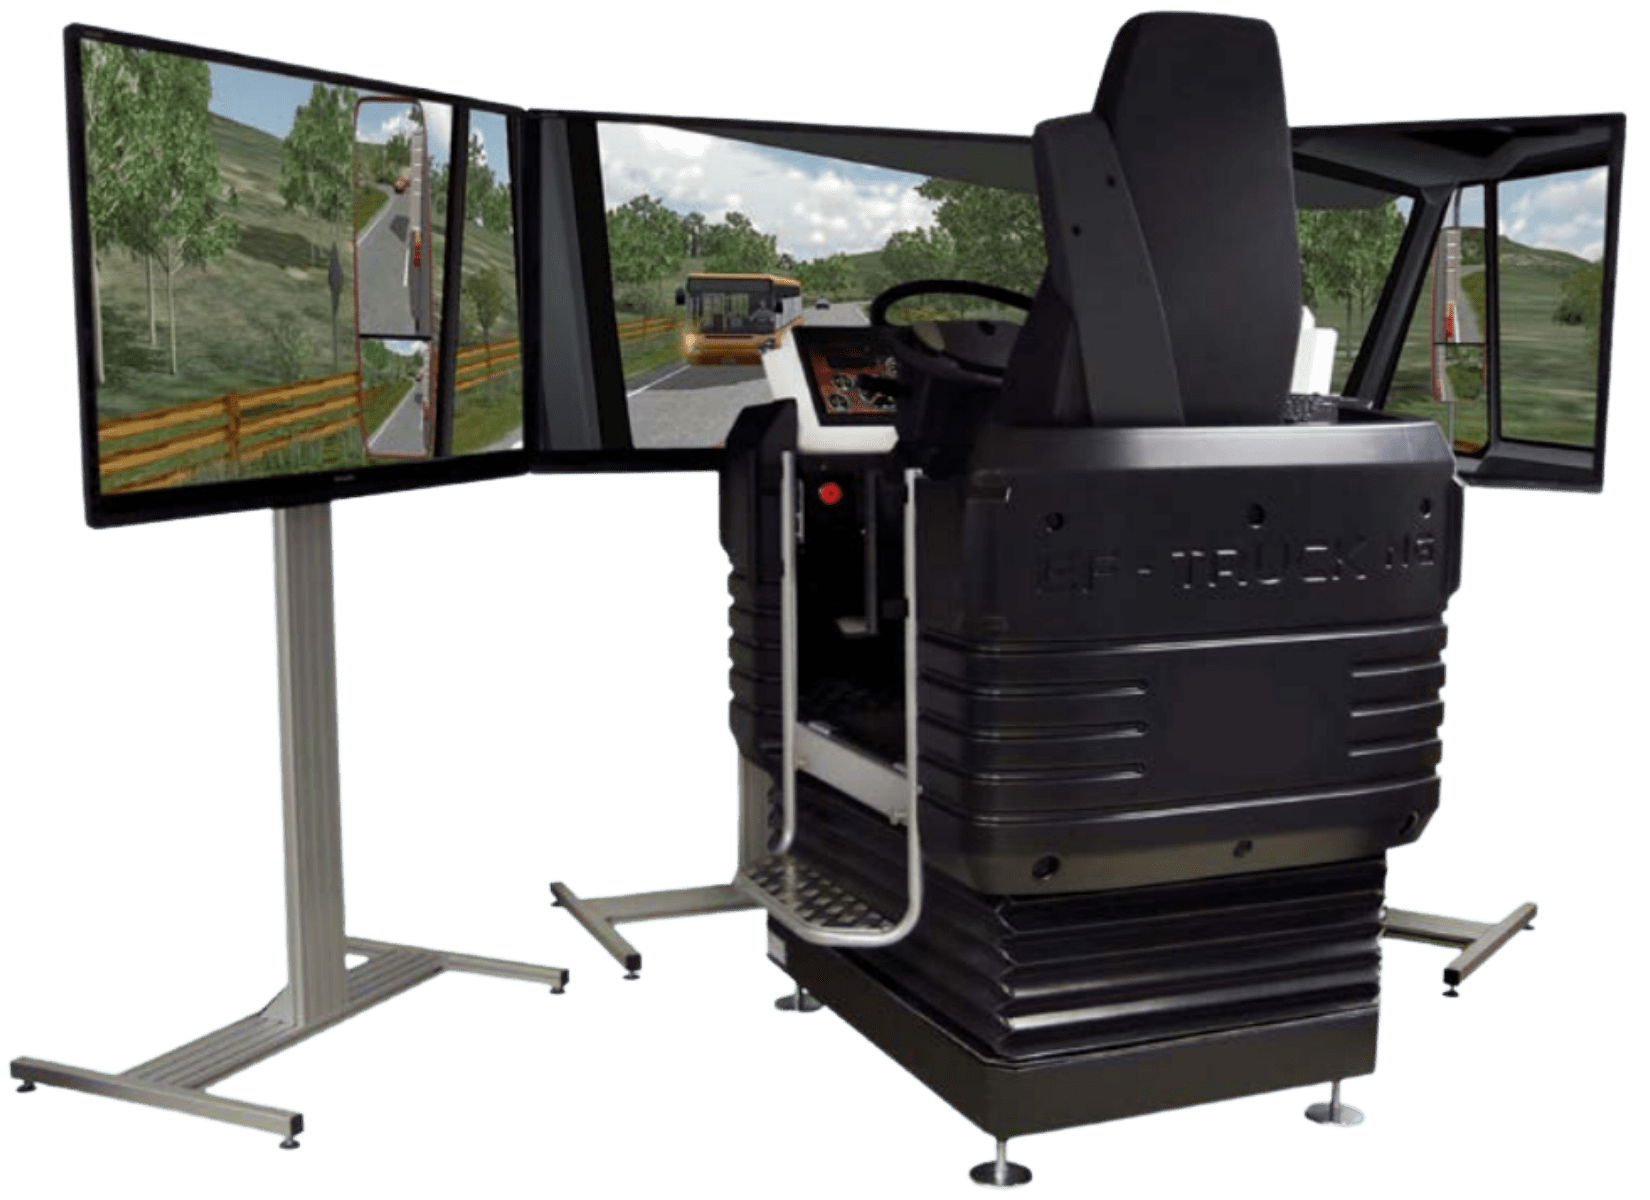 CDL Class A B and C Simulator